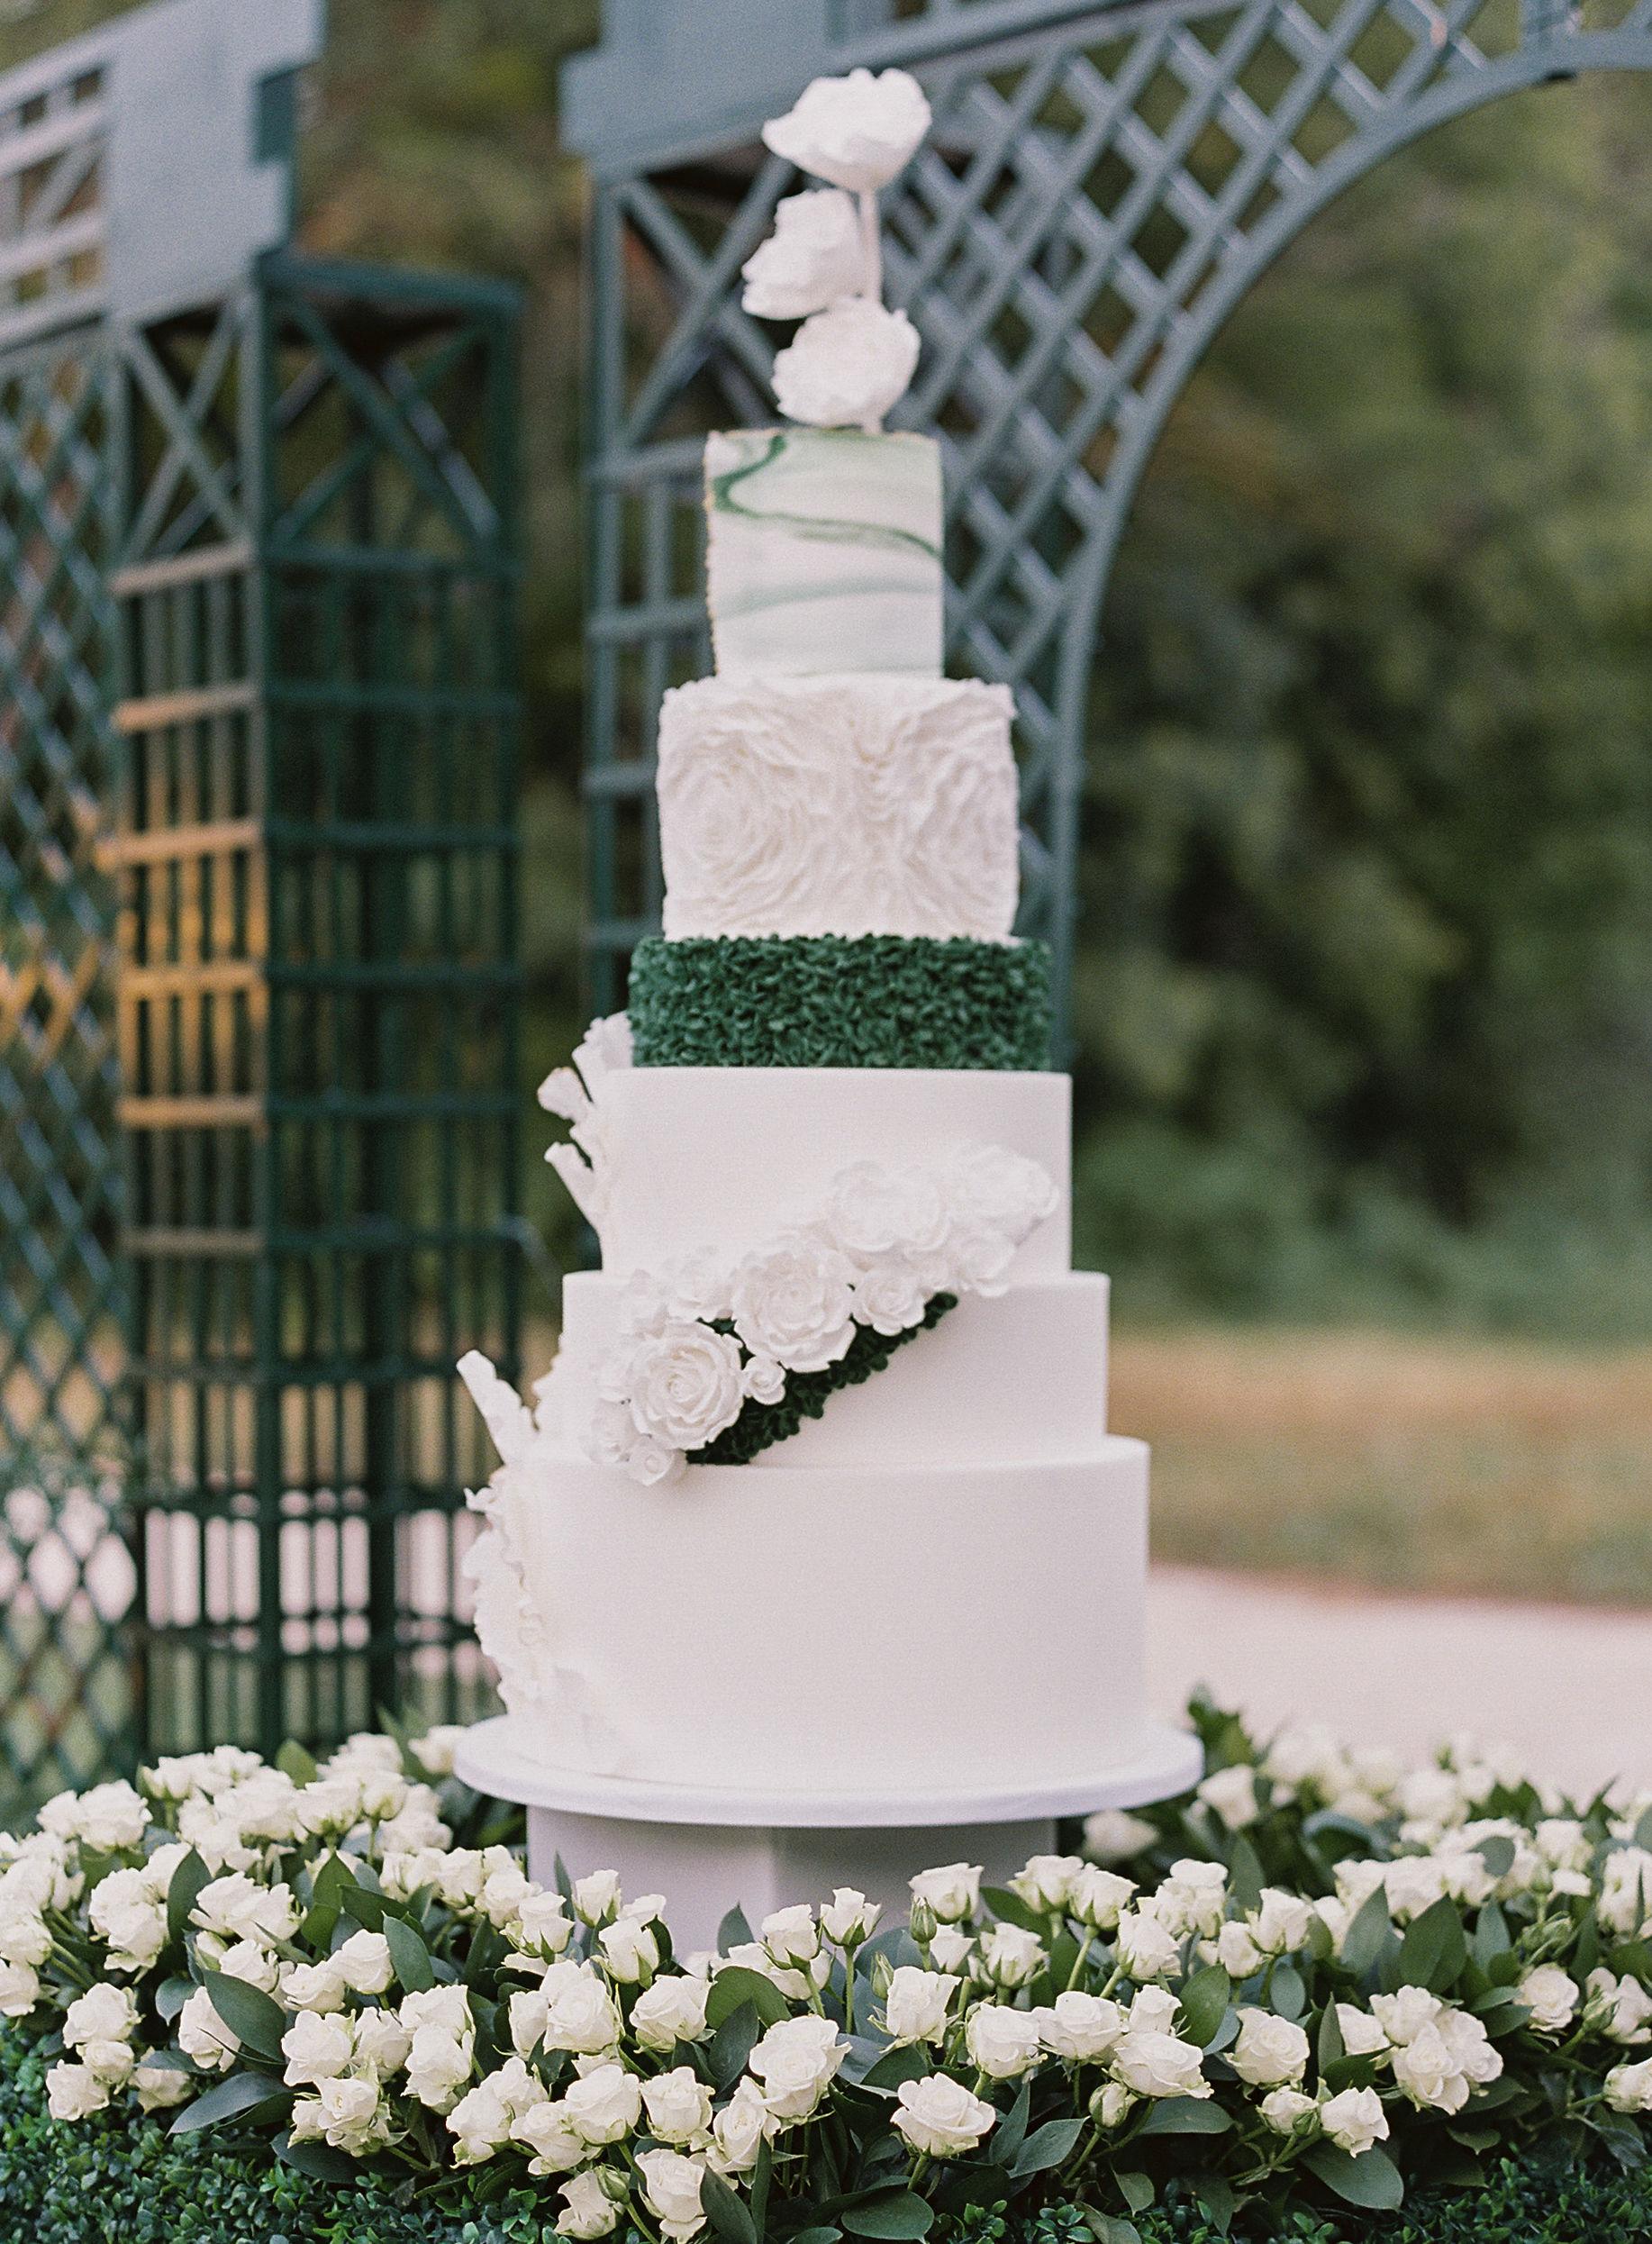 janet patrick wedding cake in garden